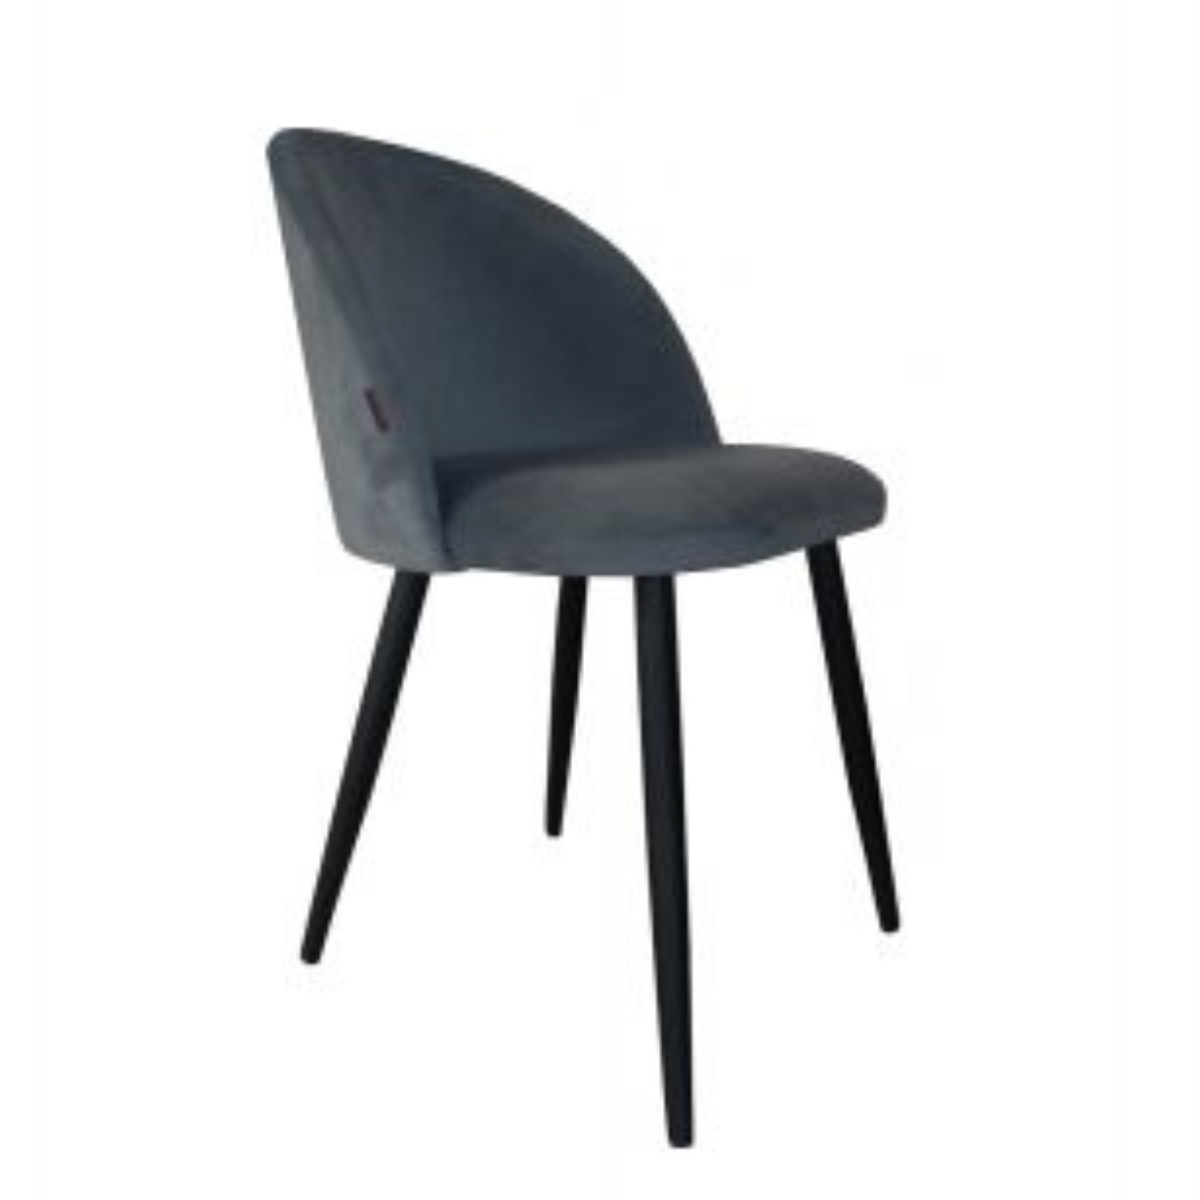 Krzesło CLAUDINE 1 BL VELVET ciemno szare